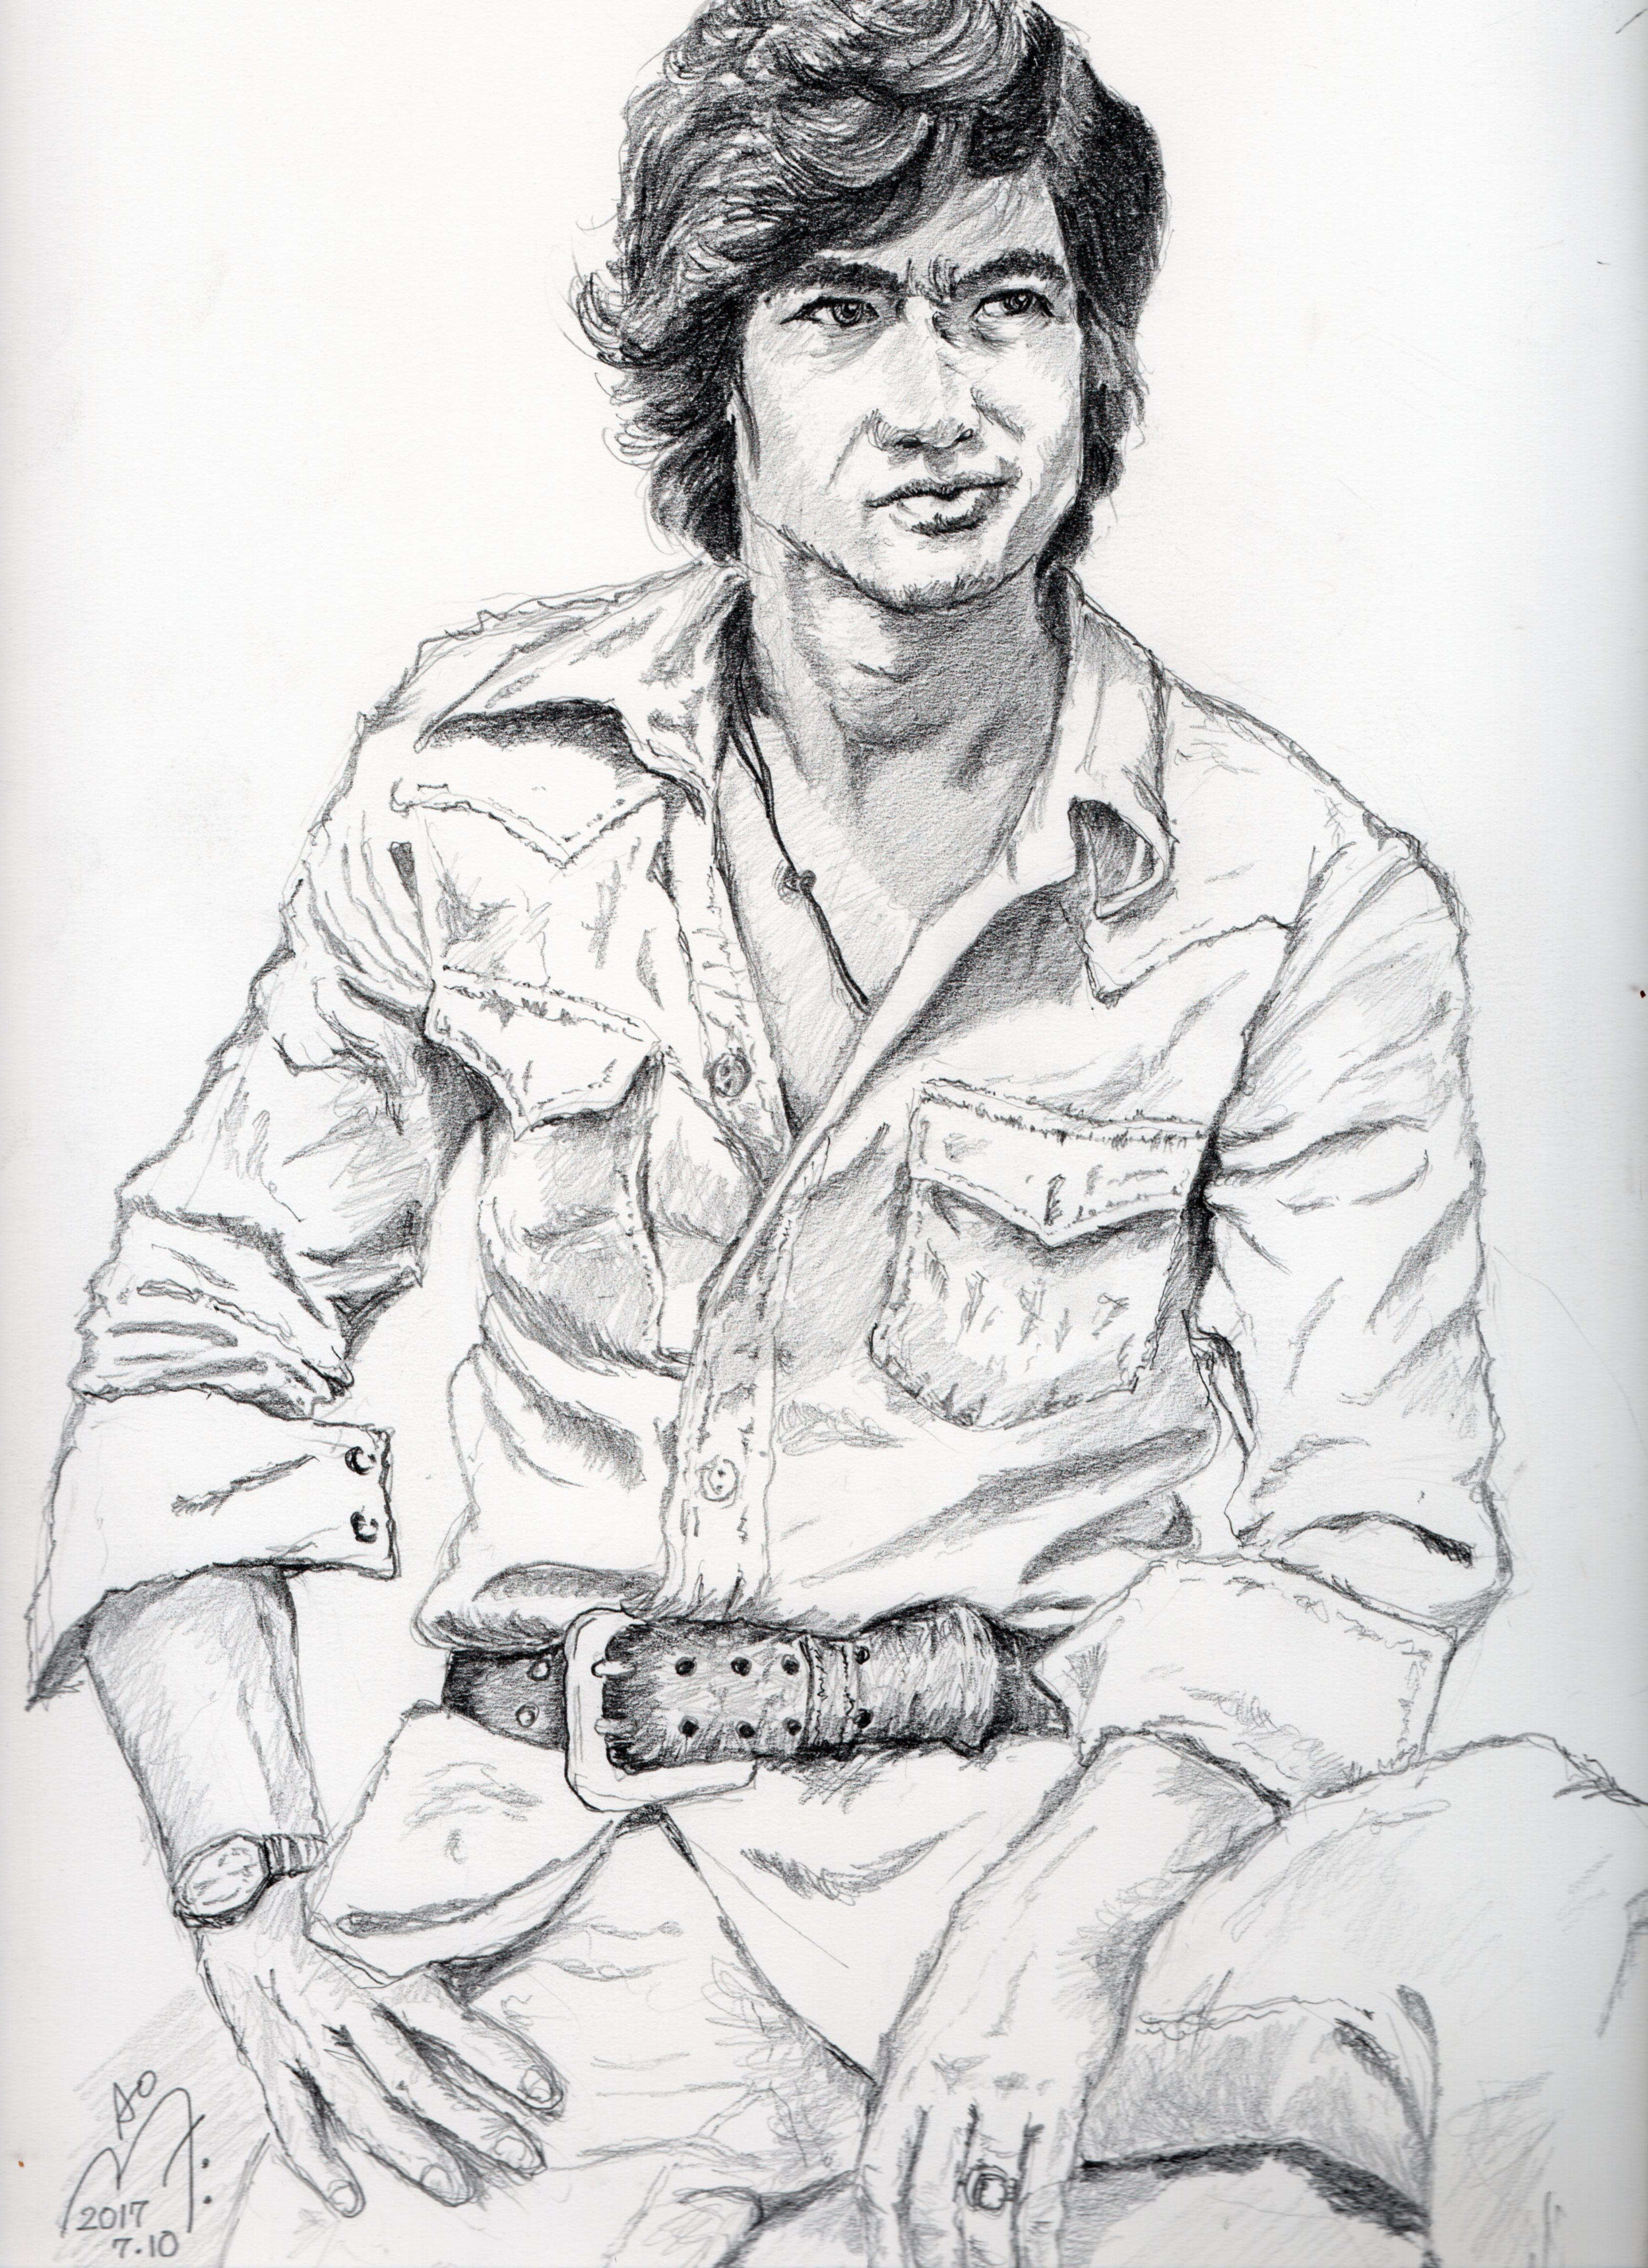 藤岡弘の鉛筆画似顔絵